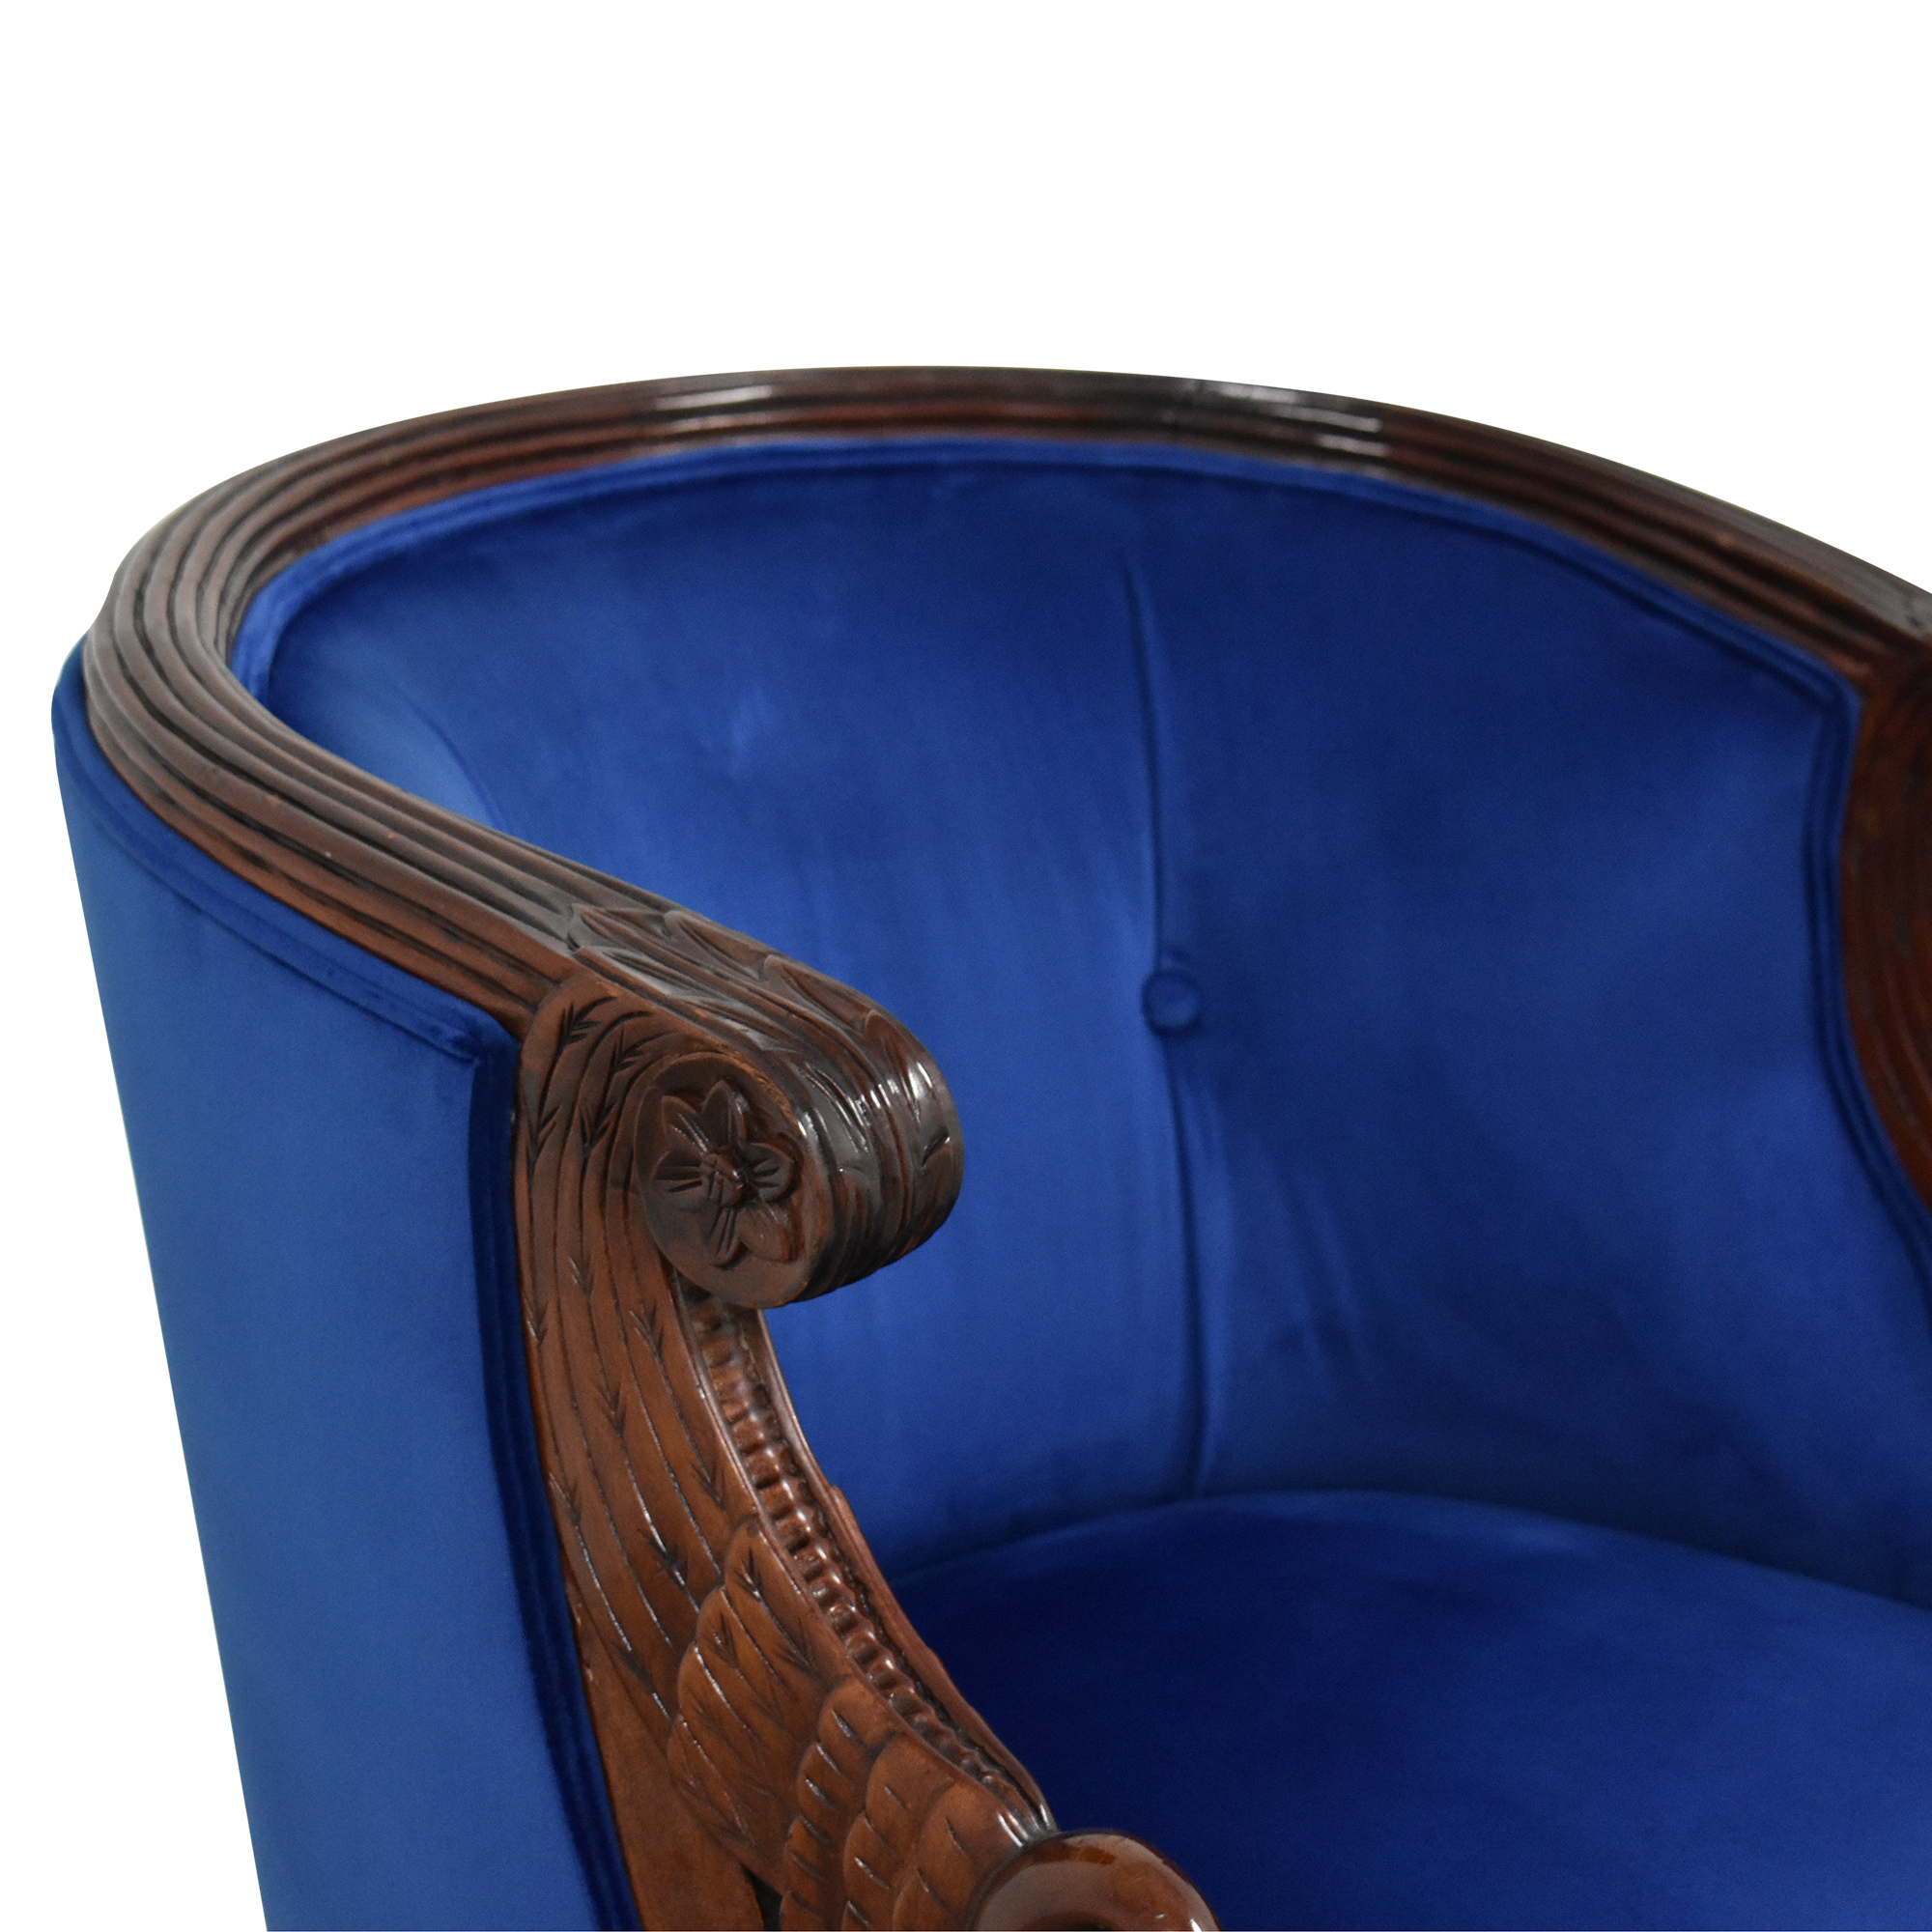 Carved Swan Tub Chair used